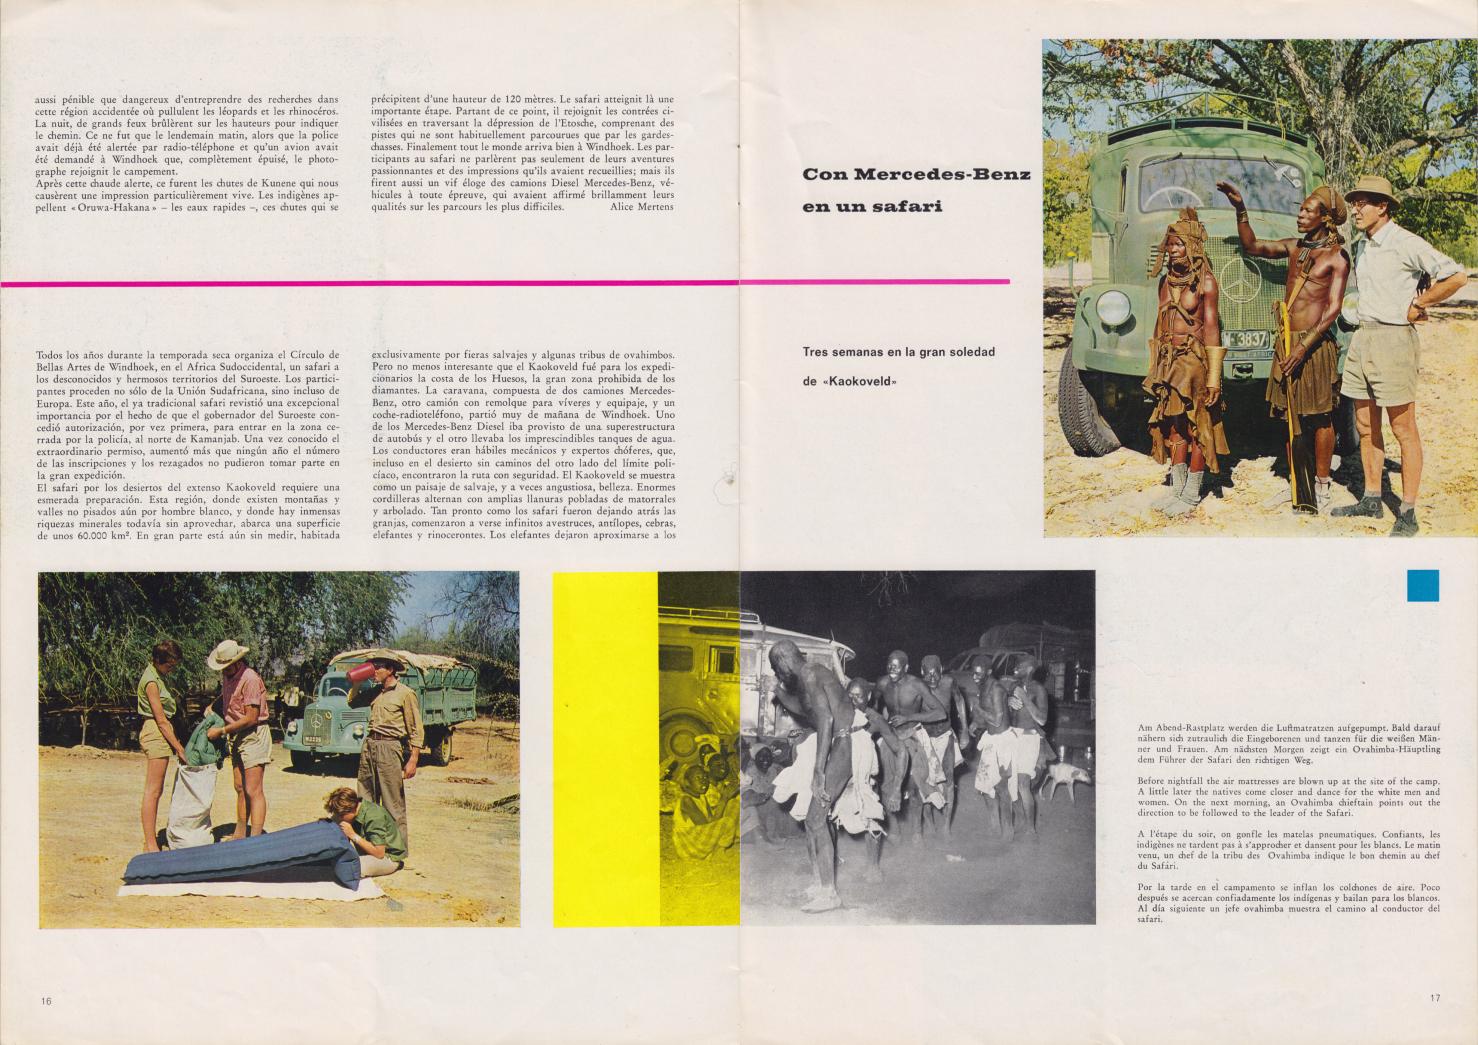 (REVISTA): Periódico In aller welt n.º 37 - Mercedes-Benz no mundo - 1959 - multilingue 009